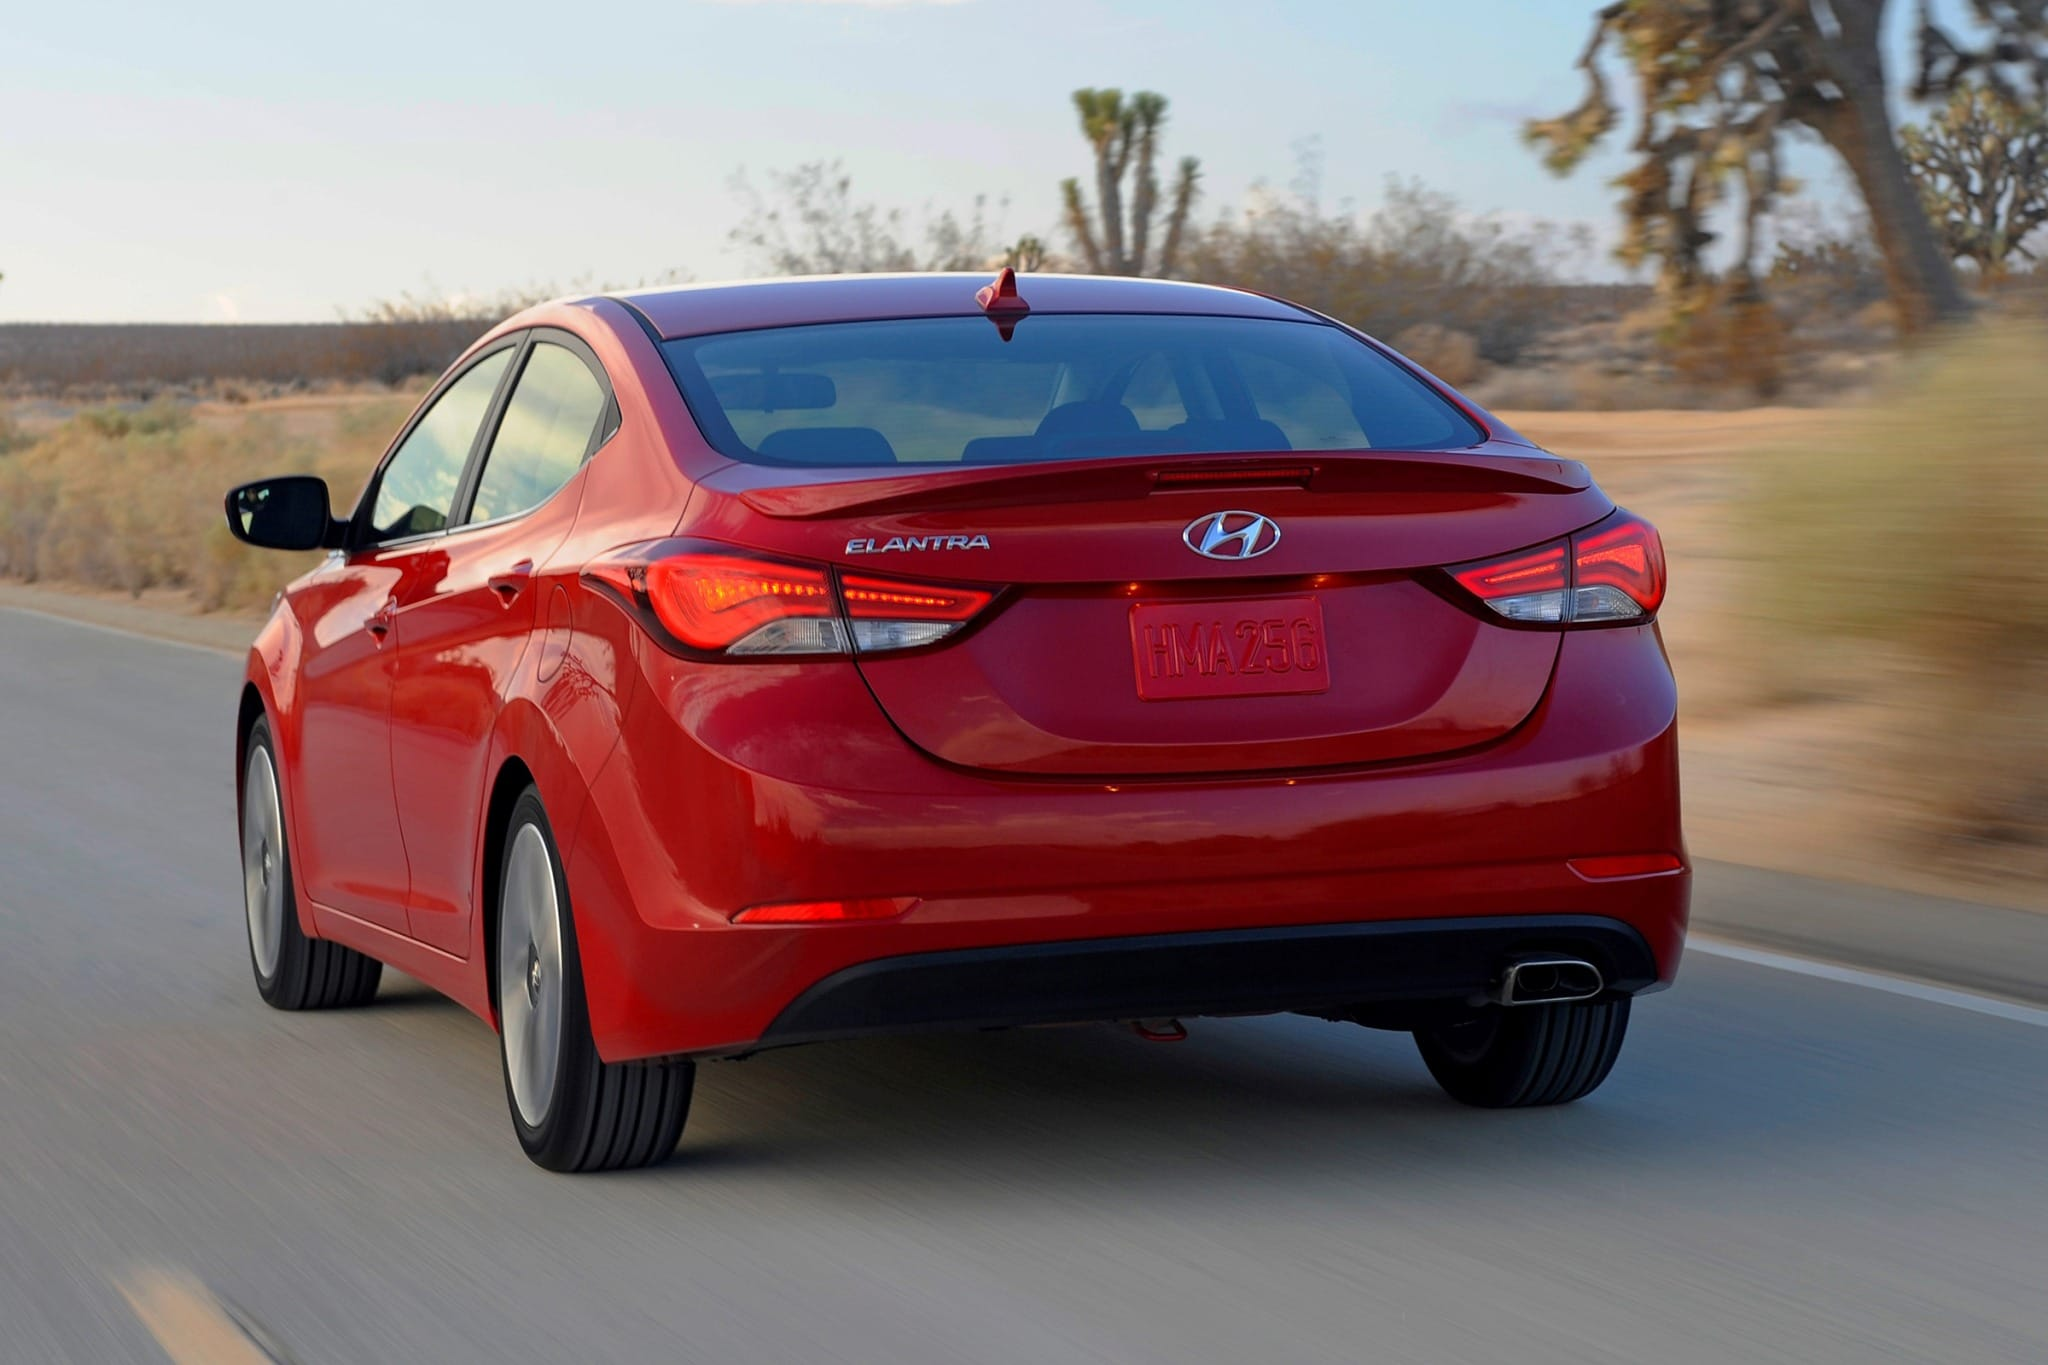 4dr Sedan 2014 Hybrid Ford Front Se Drive Wheel Fusion